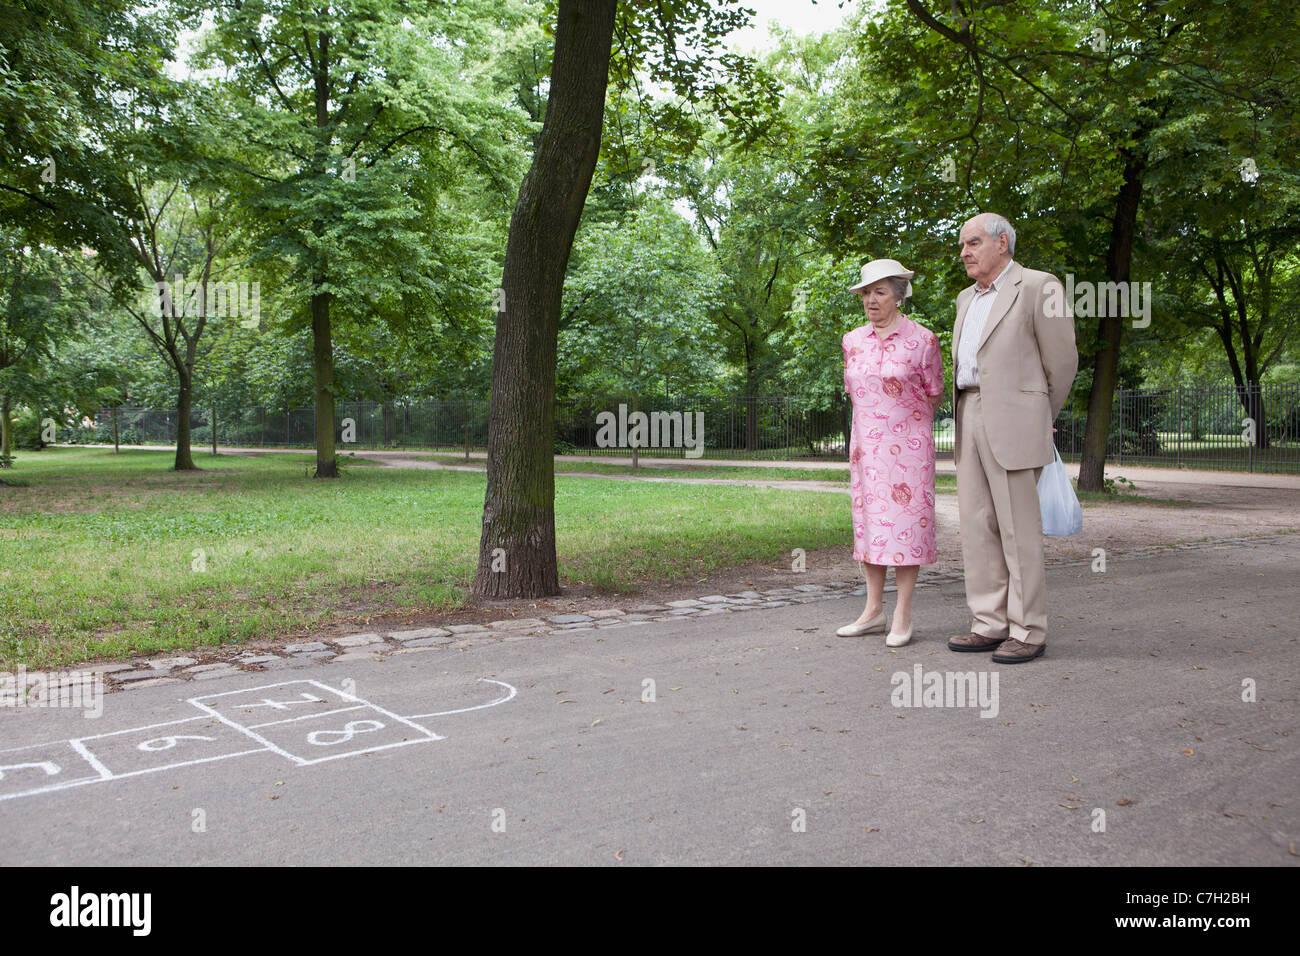 Senior couple contemplate hopscotch in the park - Stock Image